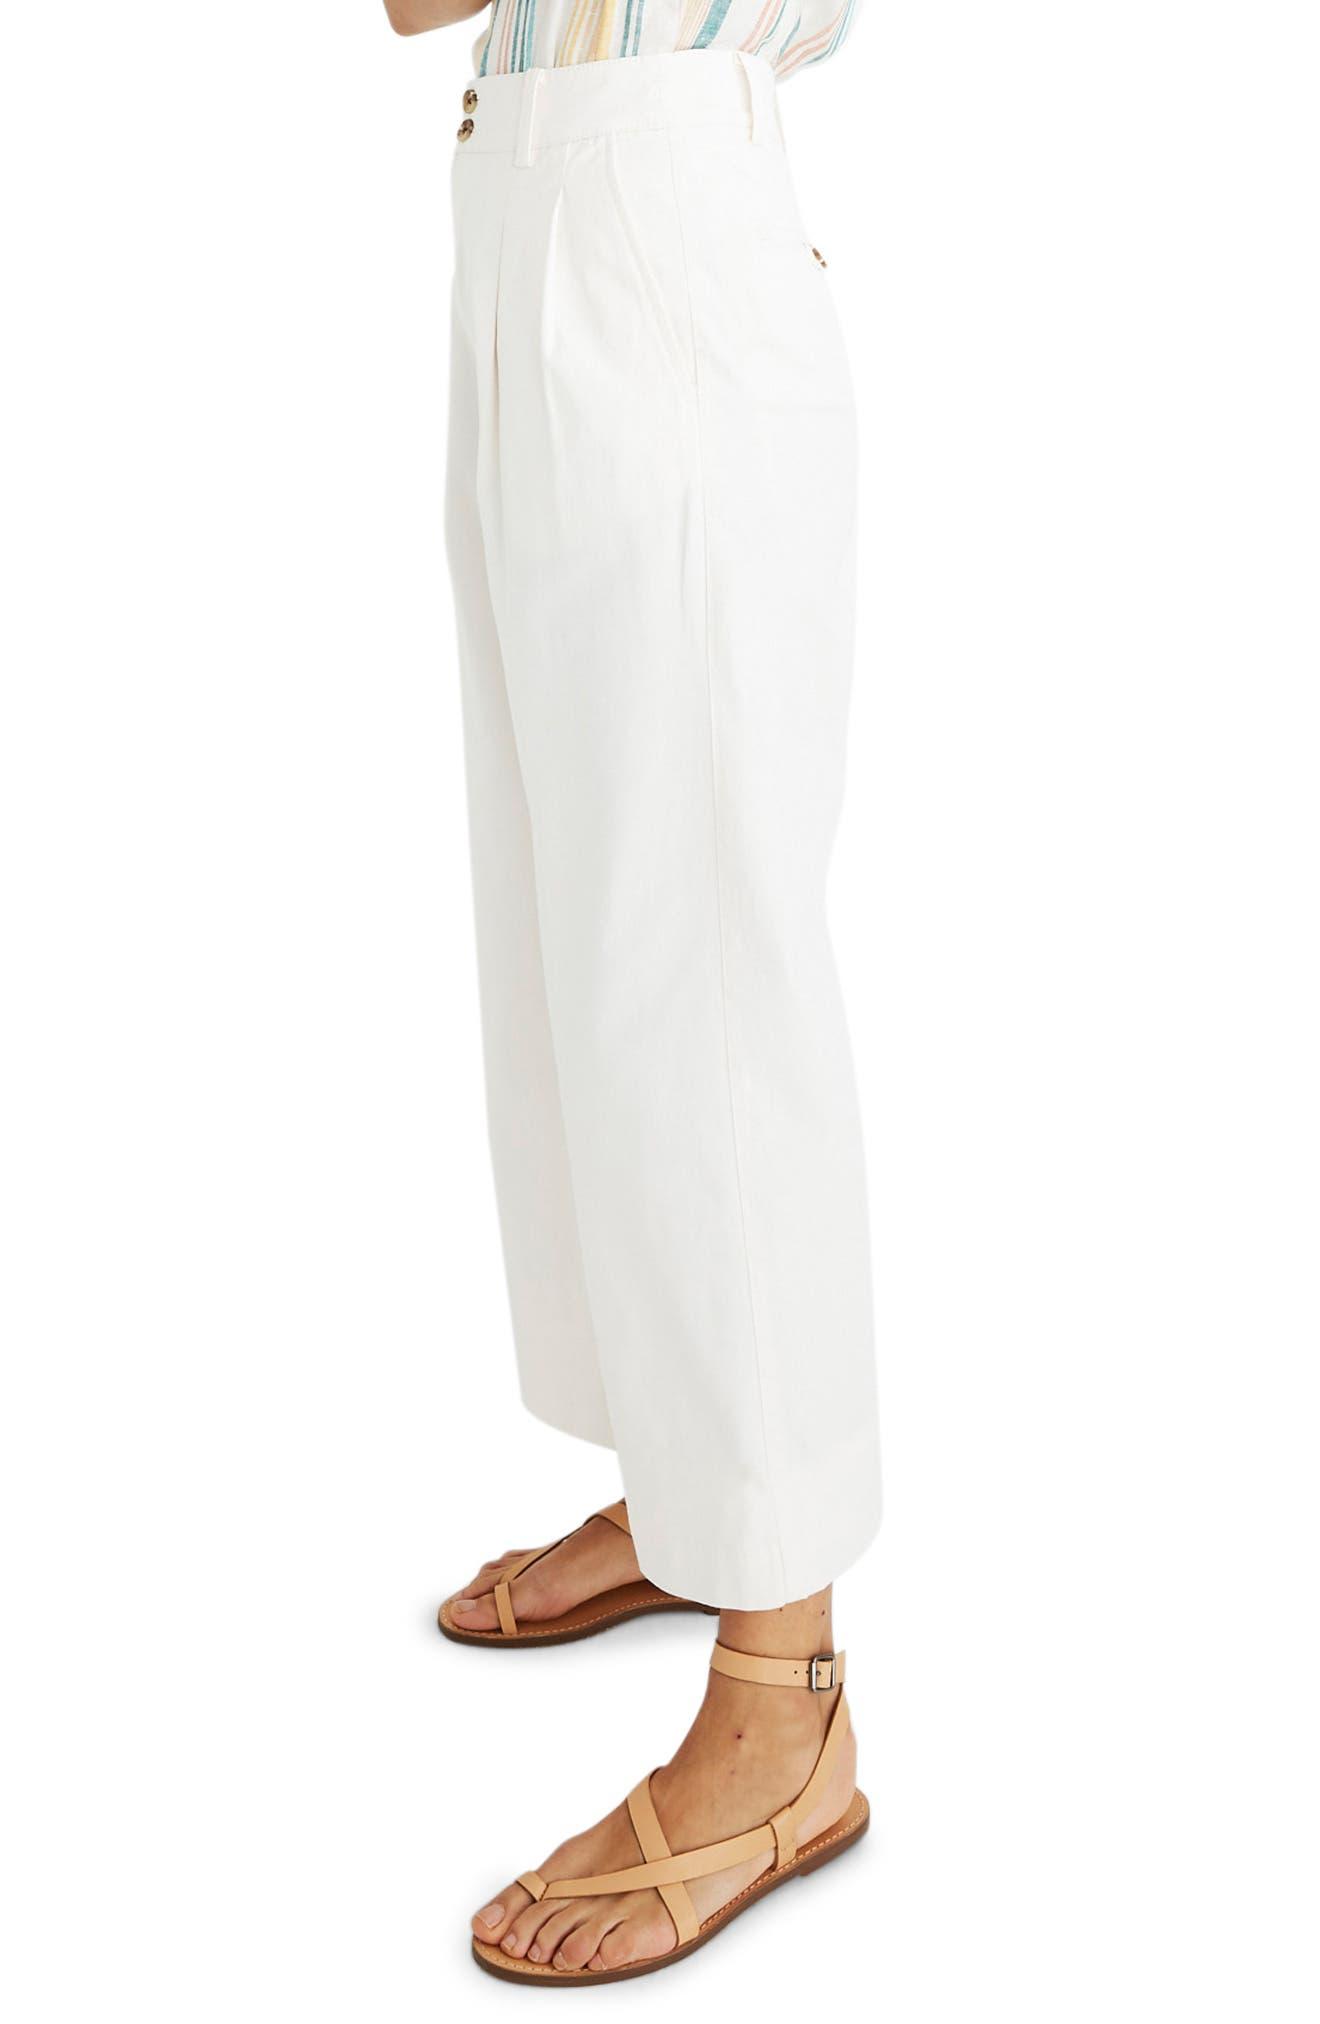 MADEWELL, High Waist Crop Wide Leg Pants, Alternate thumbnail 4, color, LIGHTHOUSE